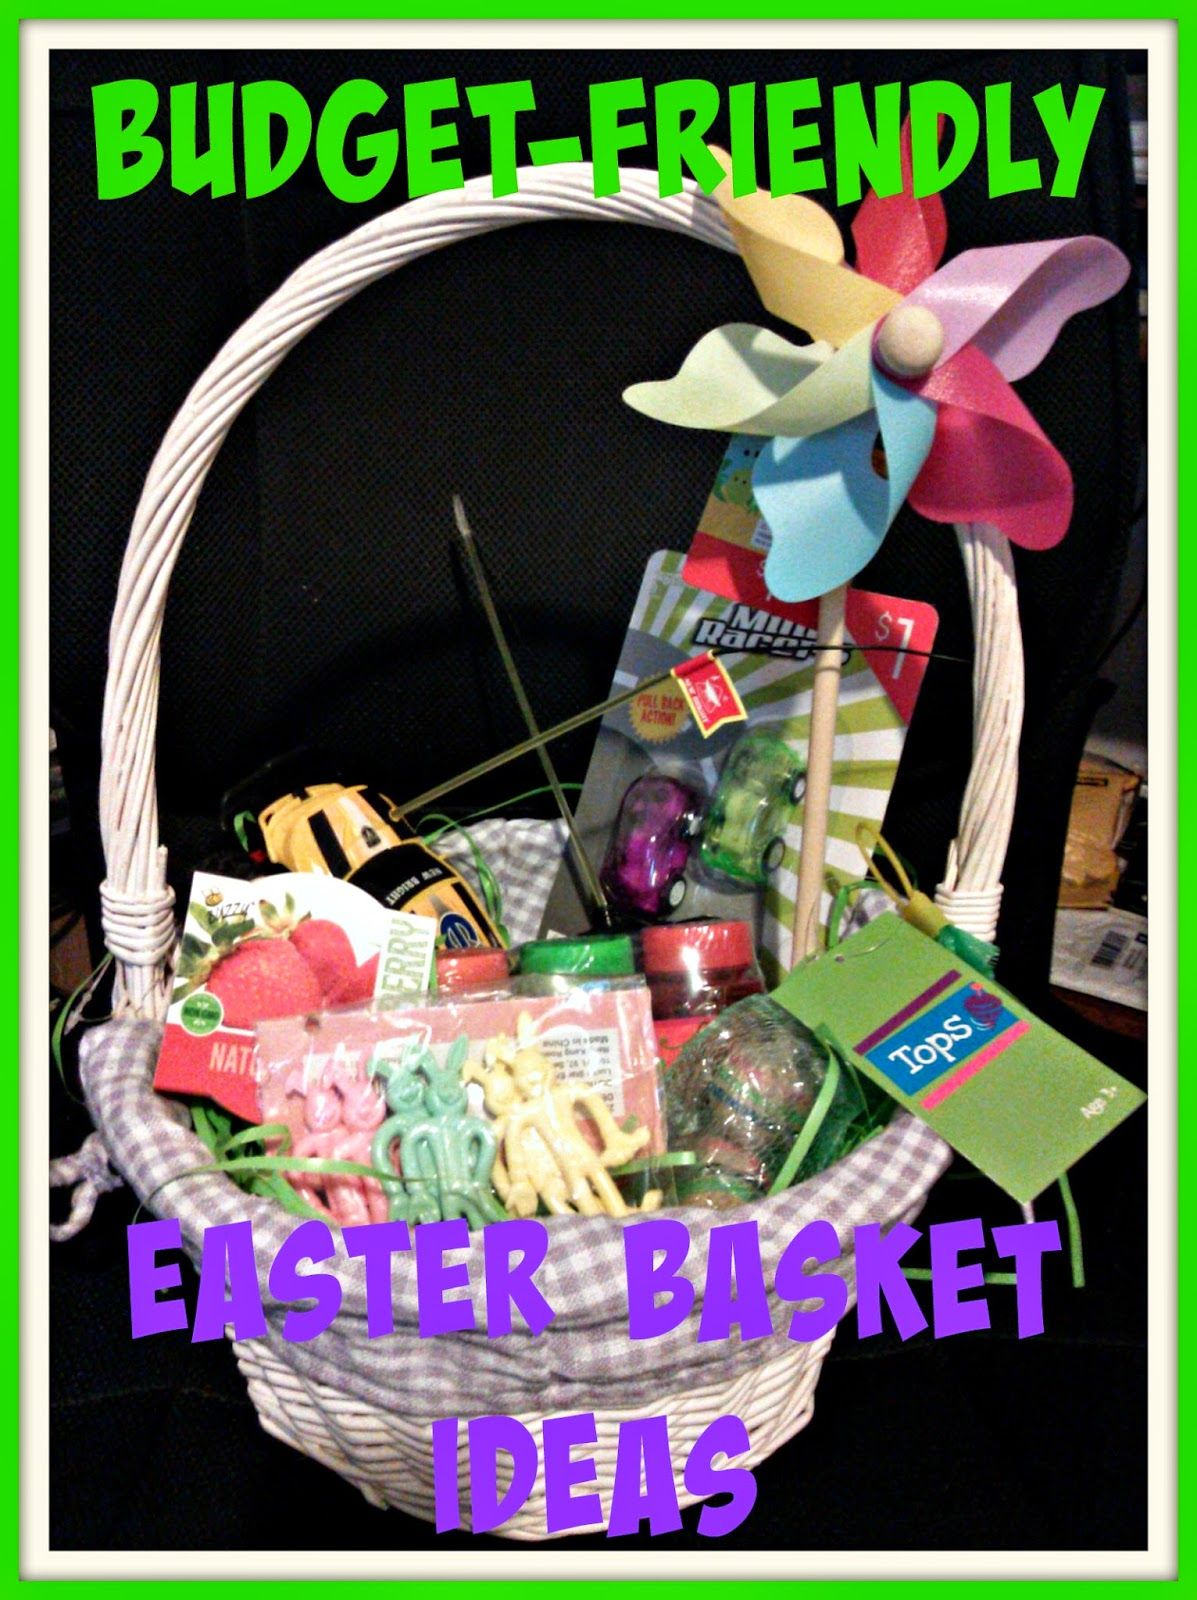 Budget friendly easter basket ideas basket ideas easter baskets mixed bag mama budget friendly easter basket ideas negle Choice Image